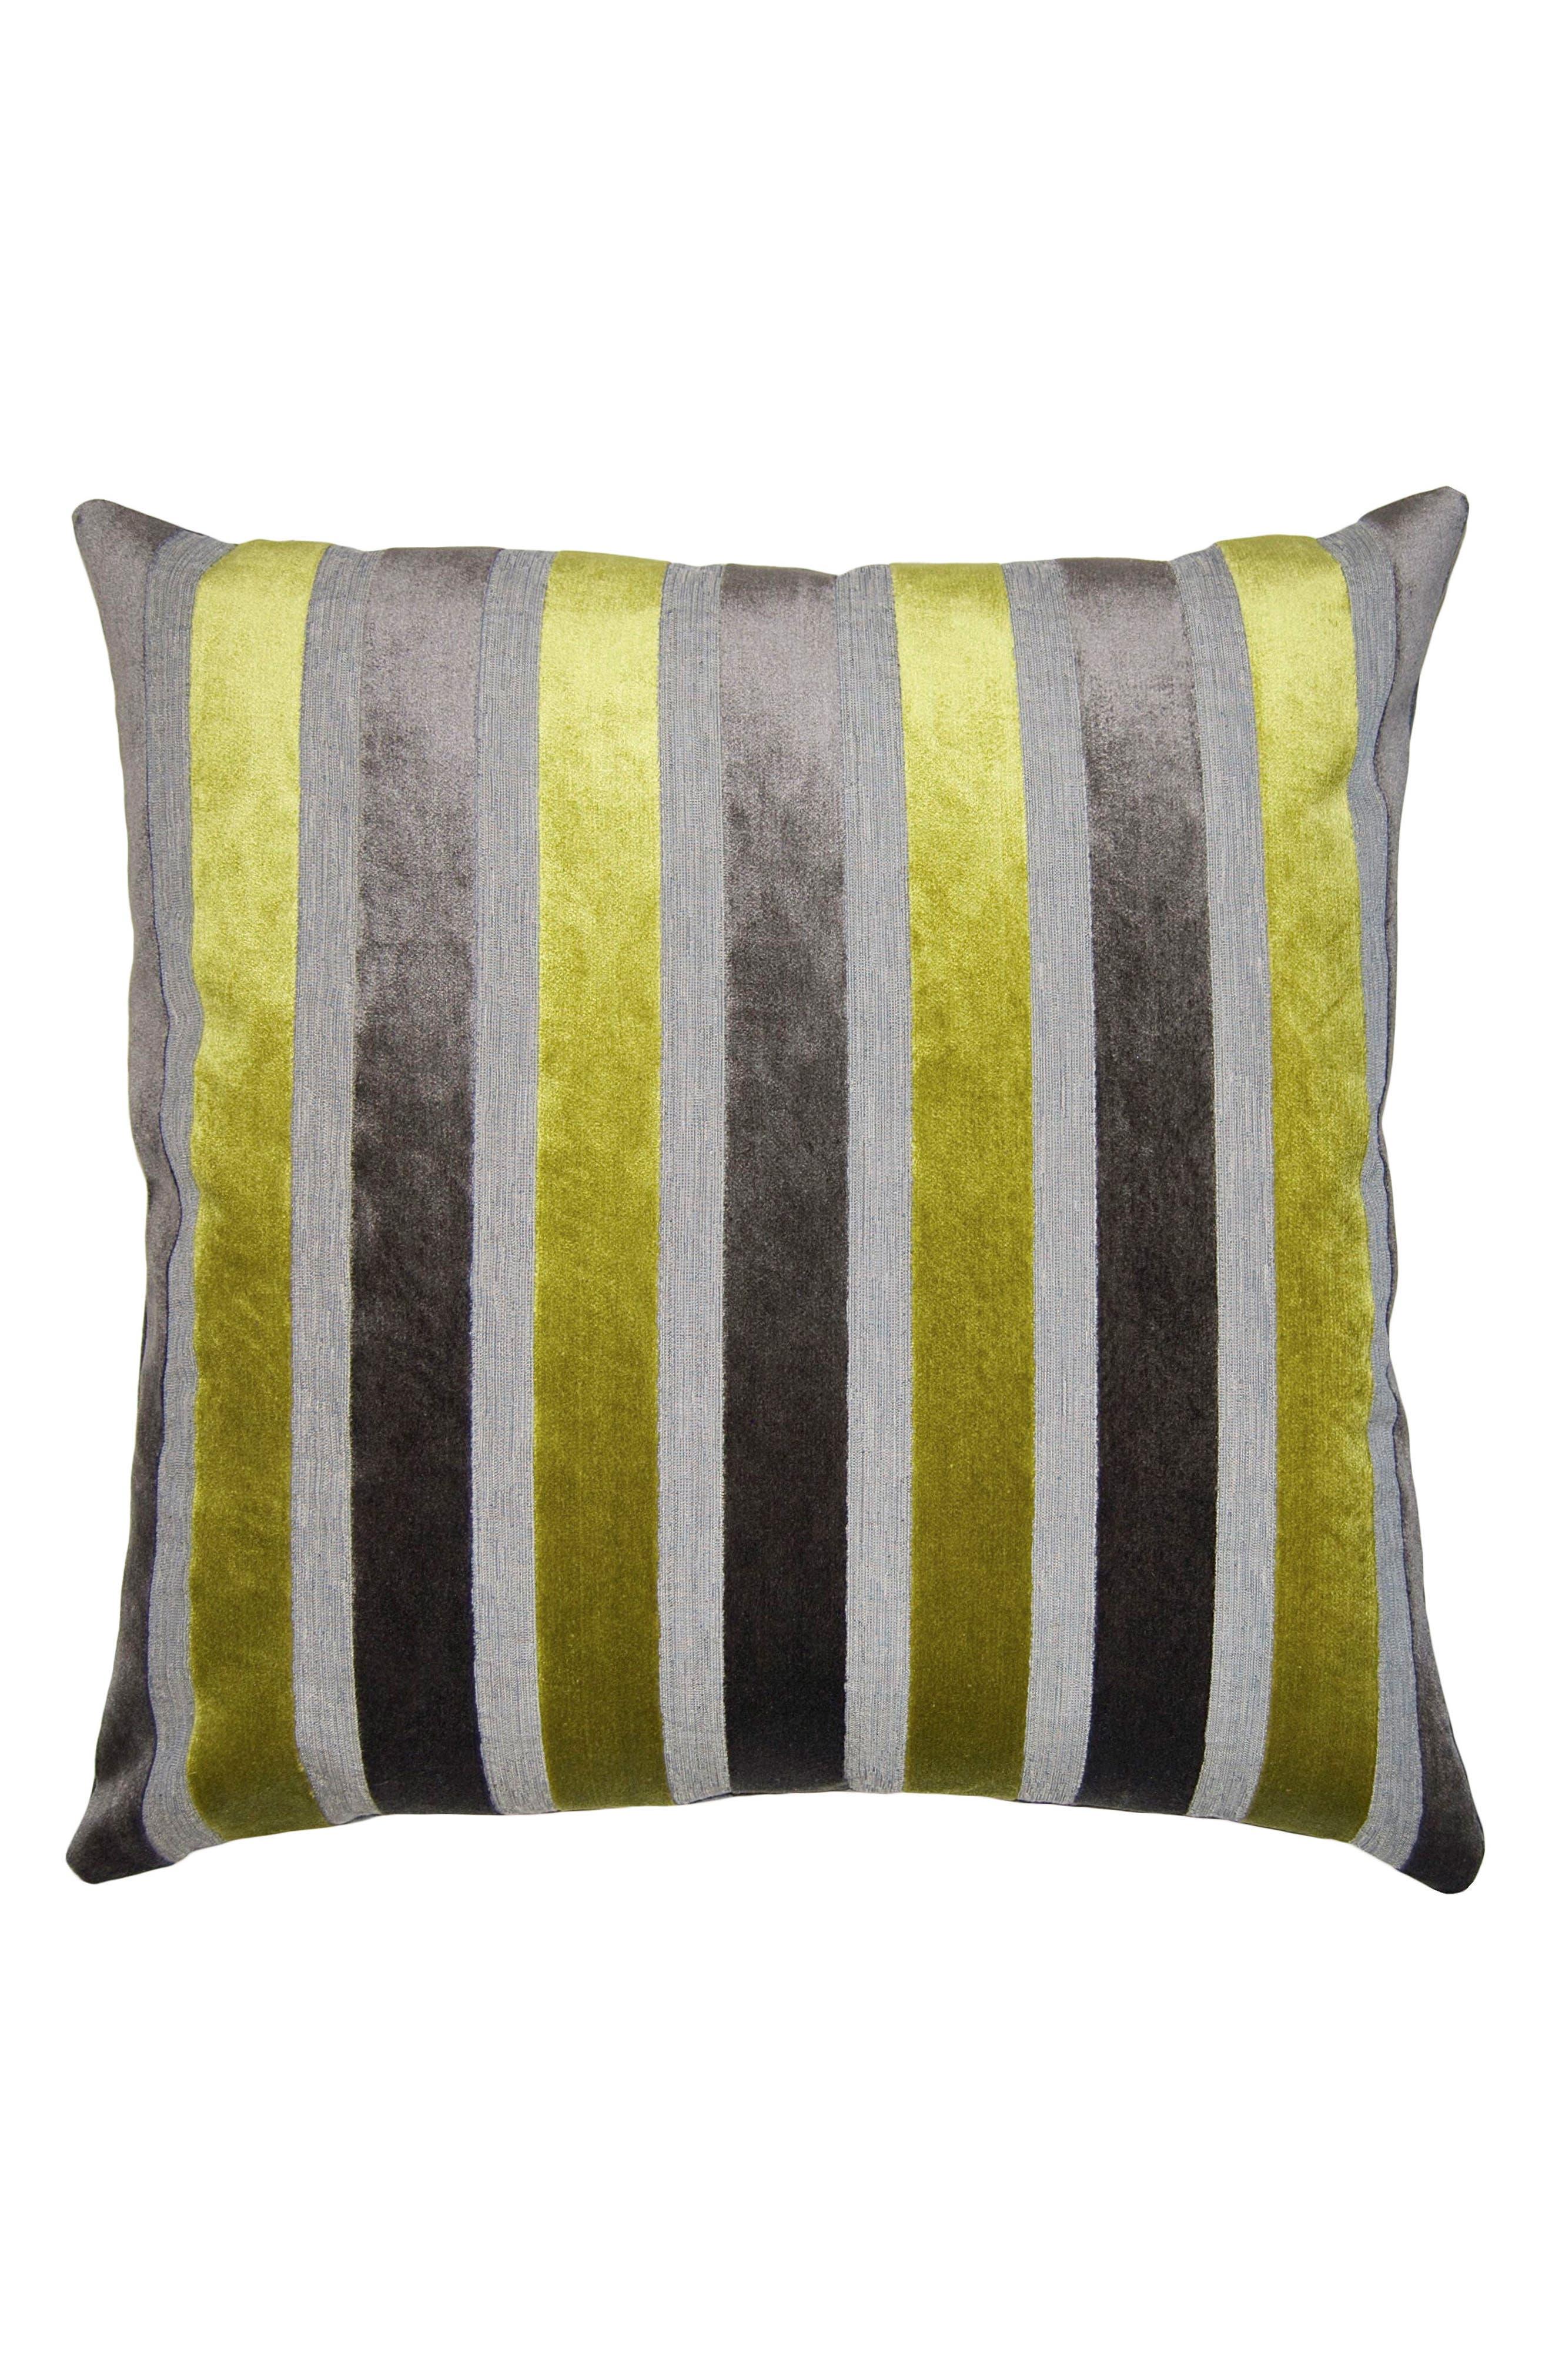 Stripe Accent Pillow,                         Main,                         color, GREY MULTI